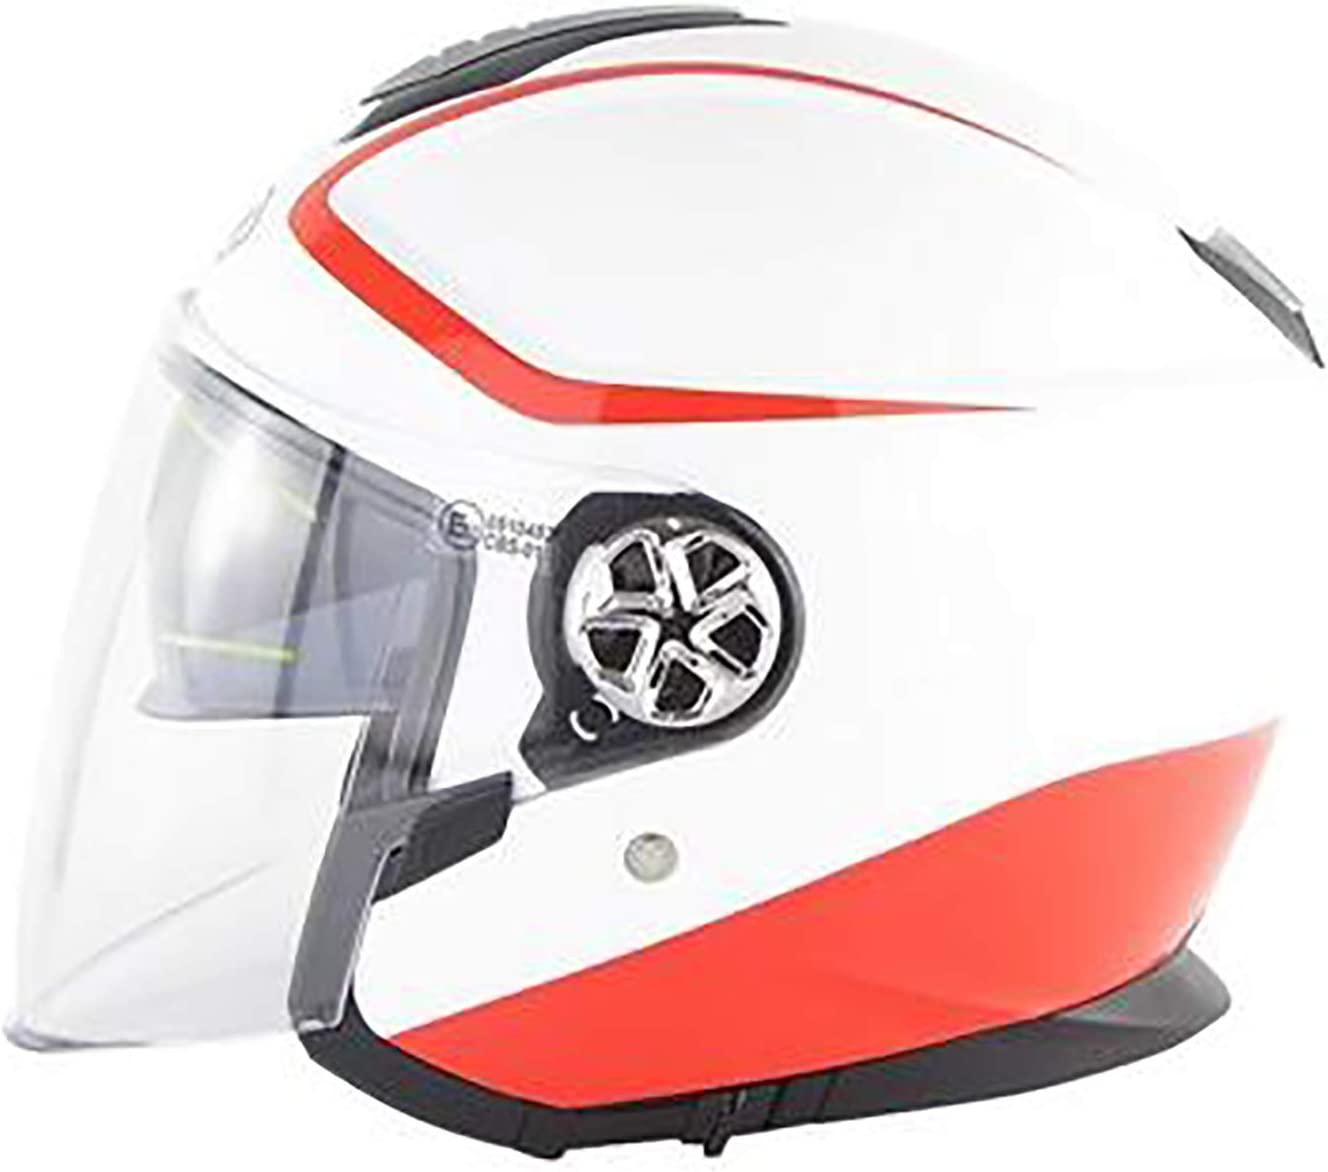 Smx Harley Retro del Casco, Moto Motocross Casco de la Vespa, Certificación Dot, 3/4 Cara Abierta Retro Piloto Casco, Doble Lente Medio Casco ECE Standard 519,XL: Amazon.es: Hogar